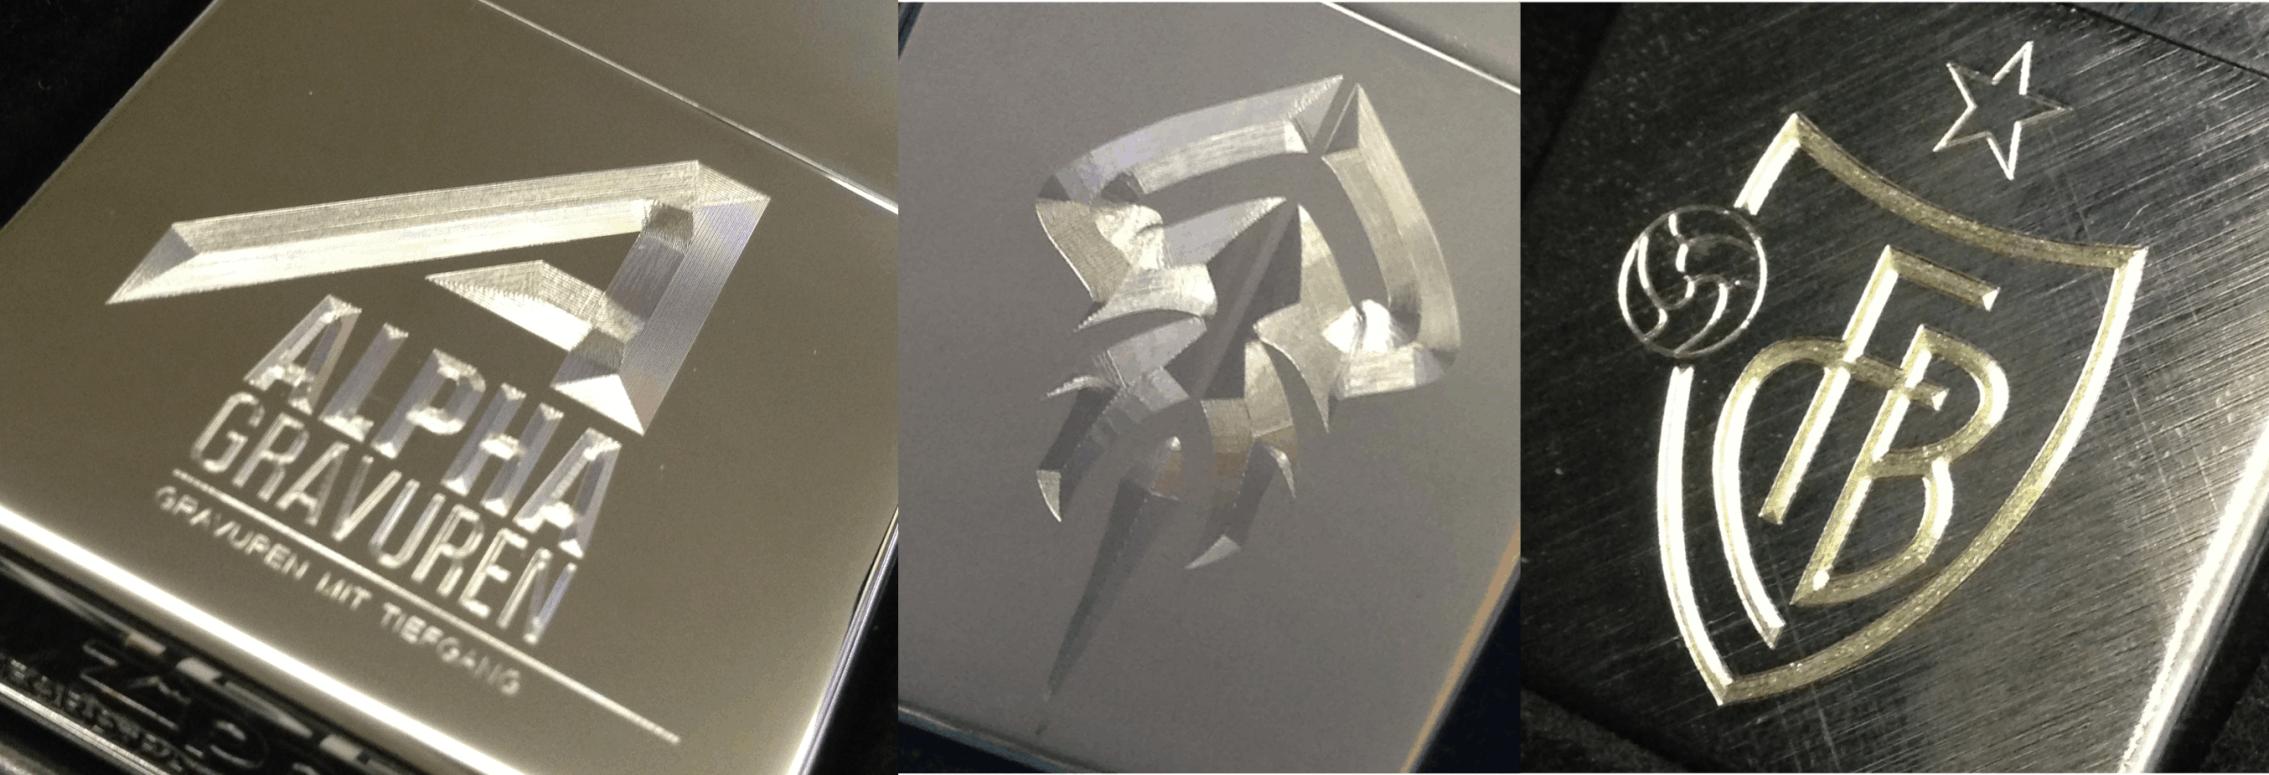 Diamantgravuren auf Zippo's